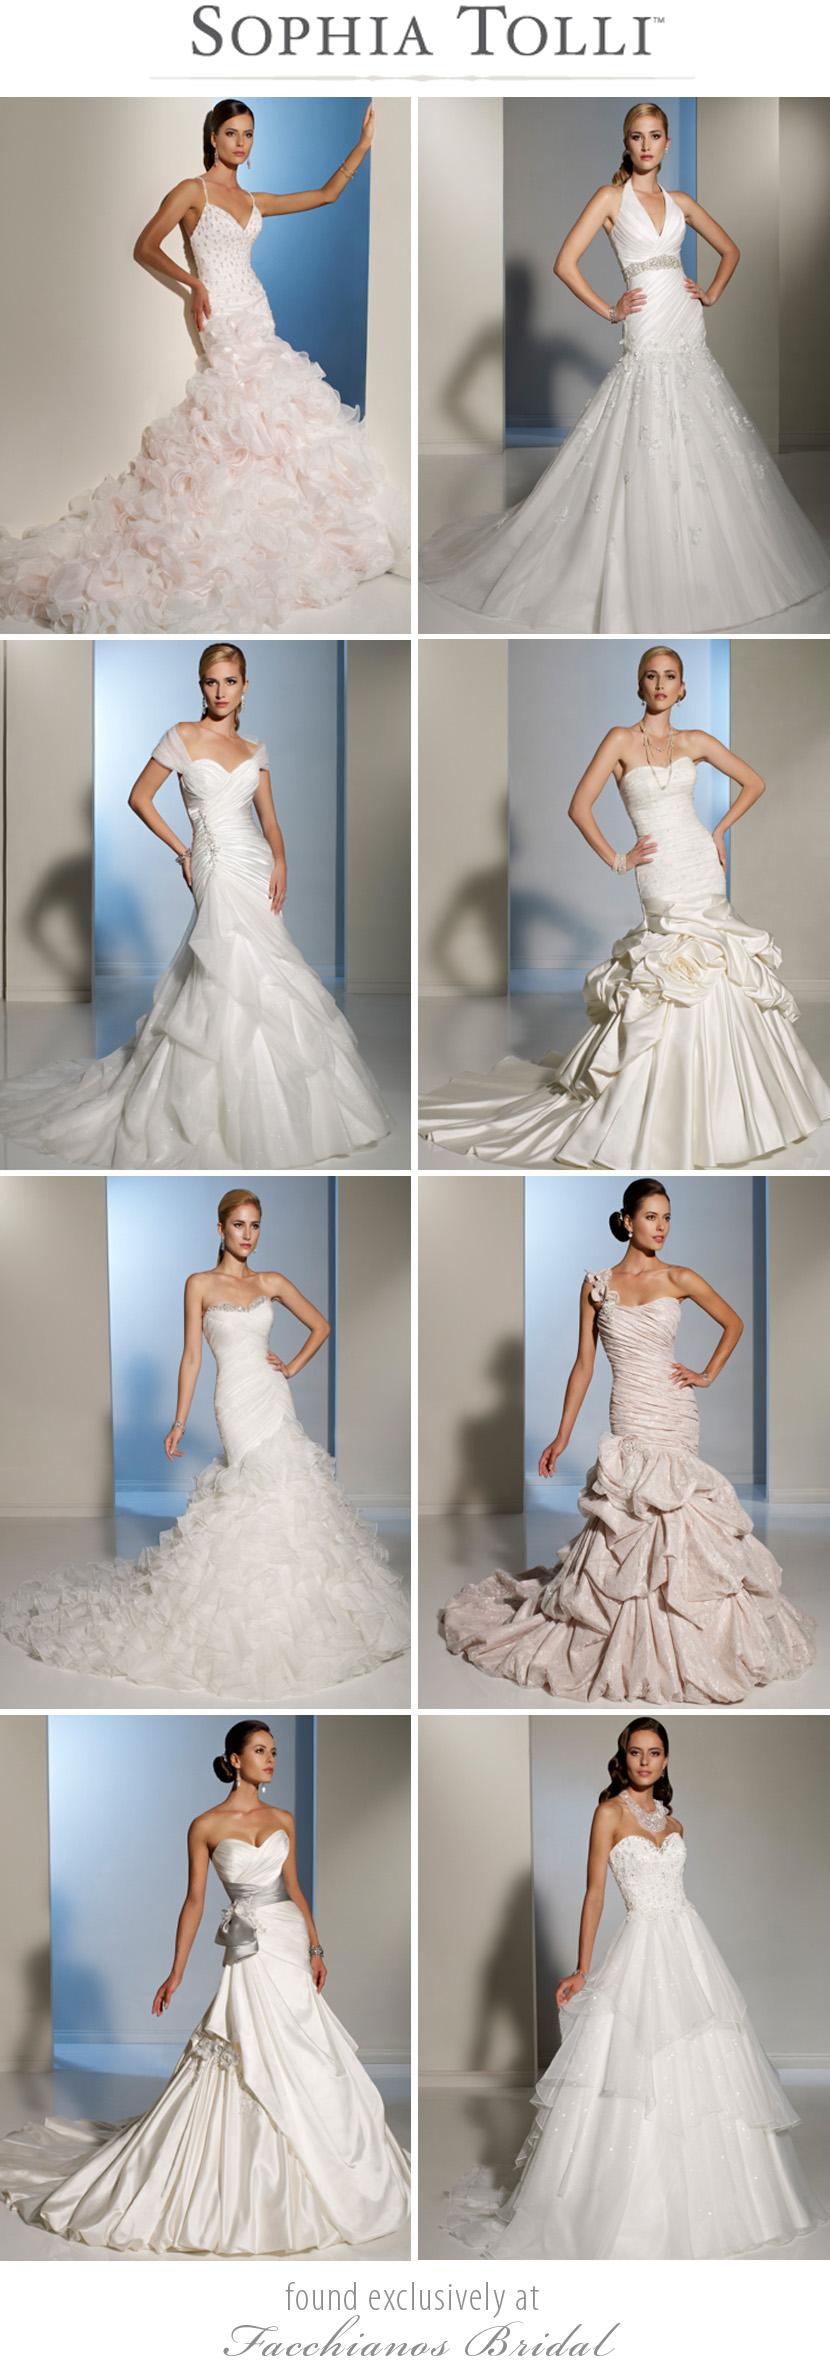 Oklahoma wedding gowns Sophia Tolli at Facchianos Bridal in Tulsa